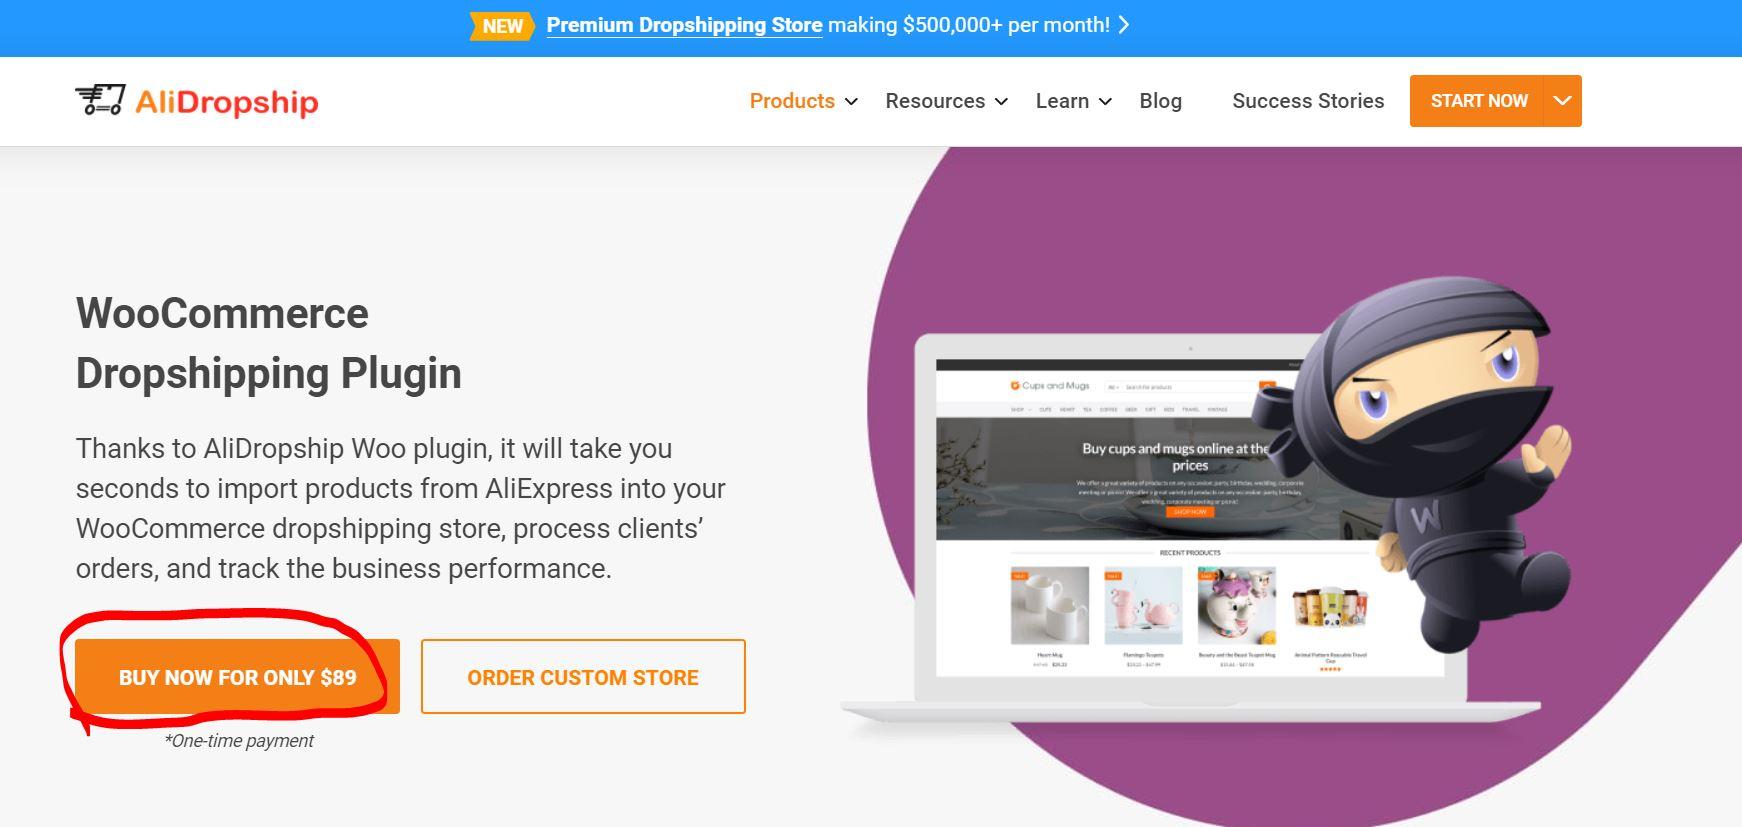 wordpress ile dropshipping 21 Wordpress ile Dropshipping Kılavuzu